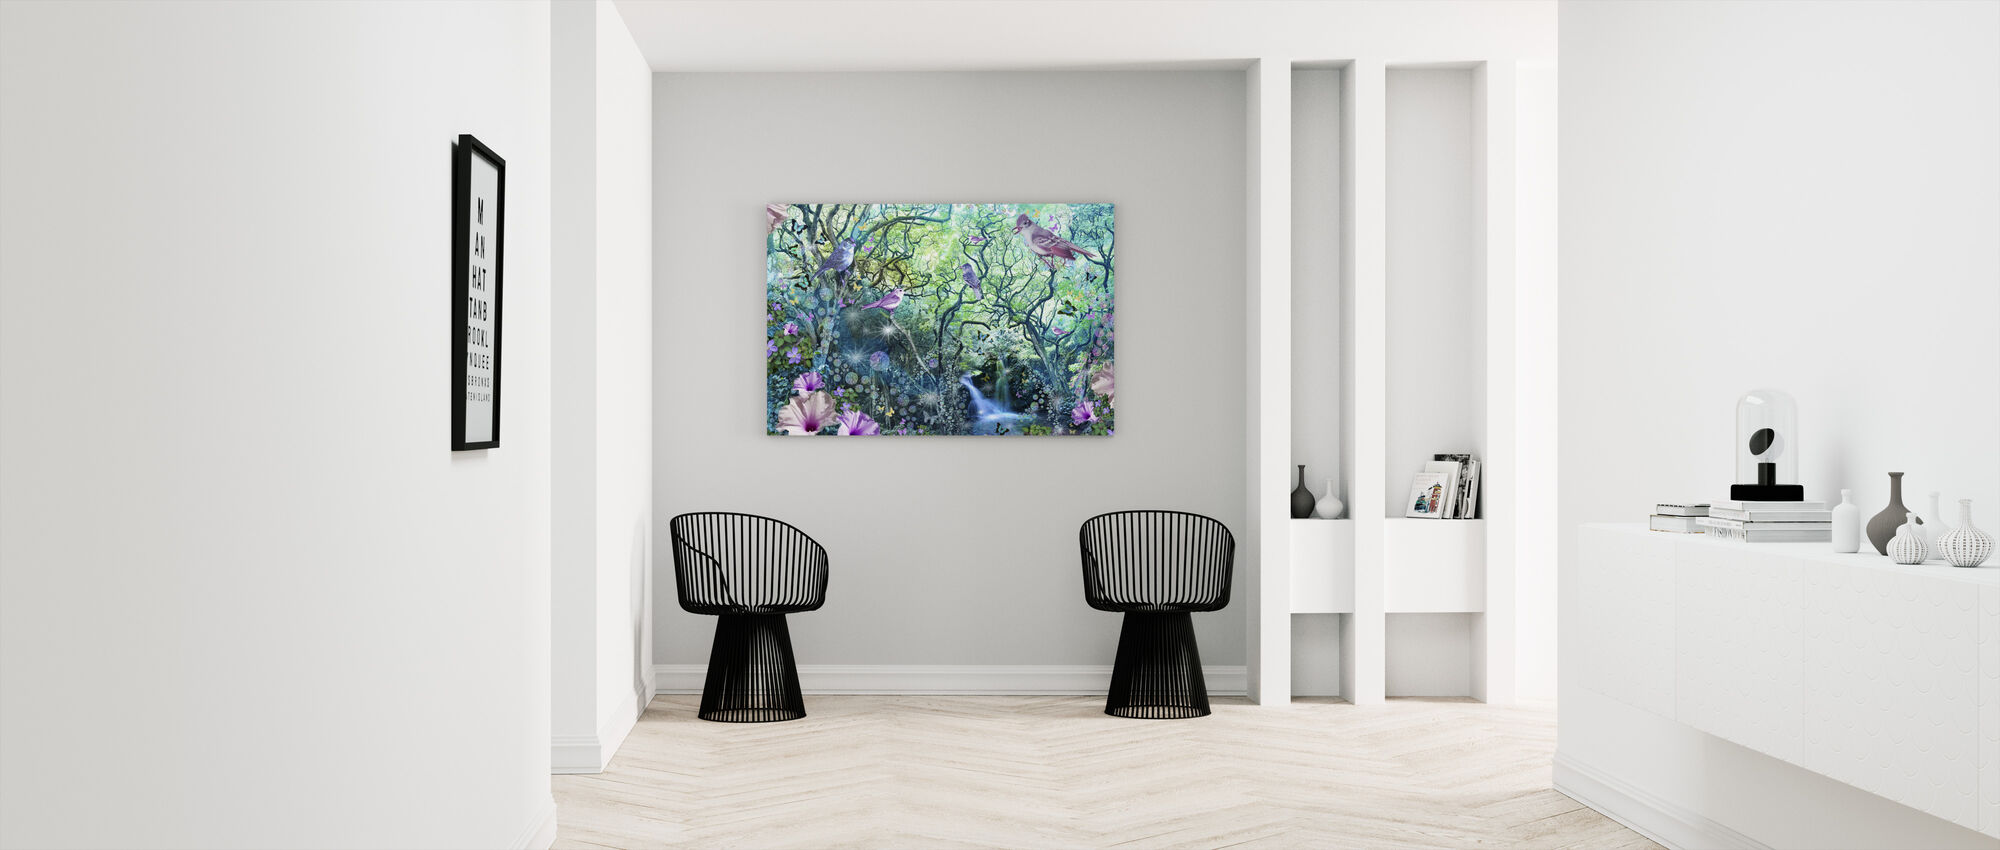 Pyörre Tree Puutarha - Canvastaulu - Aula